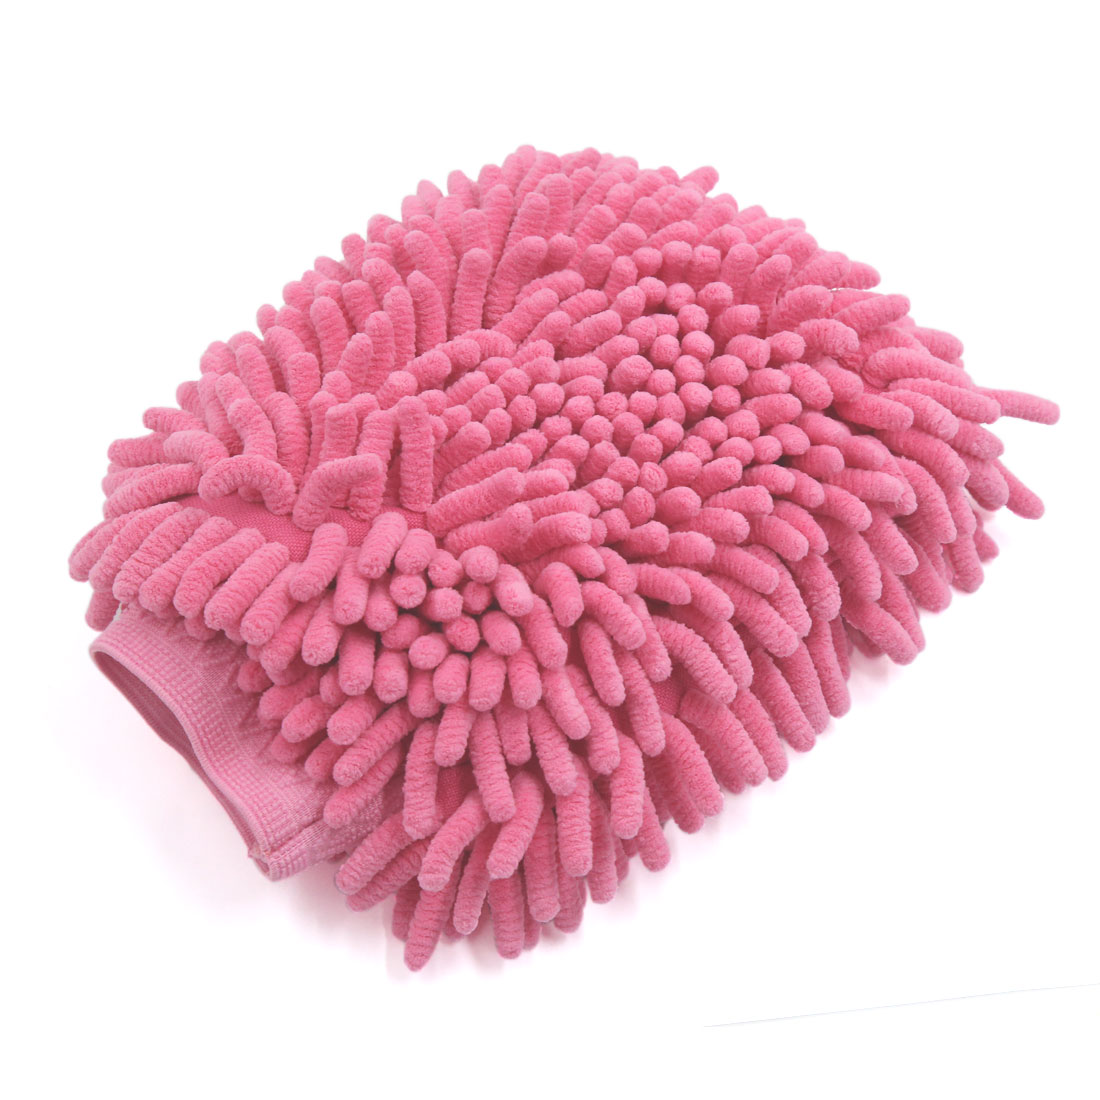 Fuchsia Microfiber Chenille Wash Mitt Car Window Washing Cleaning Glove Duster